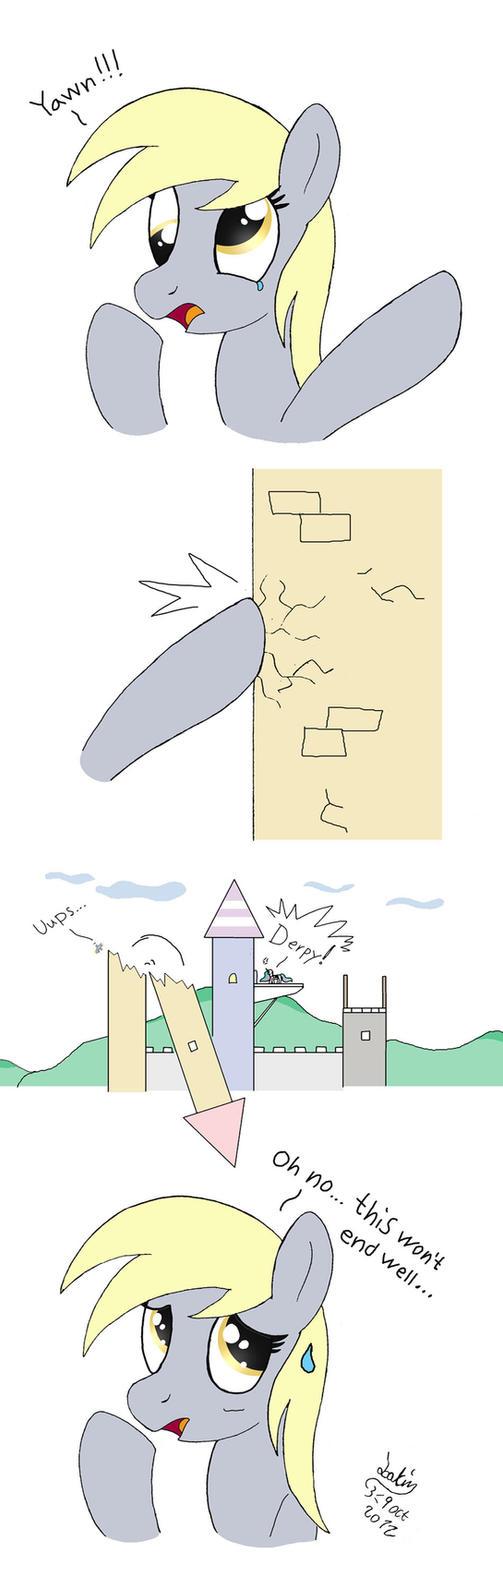 MLP FIM comic - Derpy Hooves Ups... by Joakaha